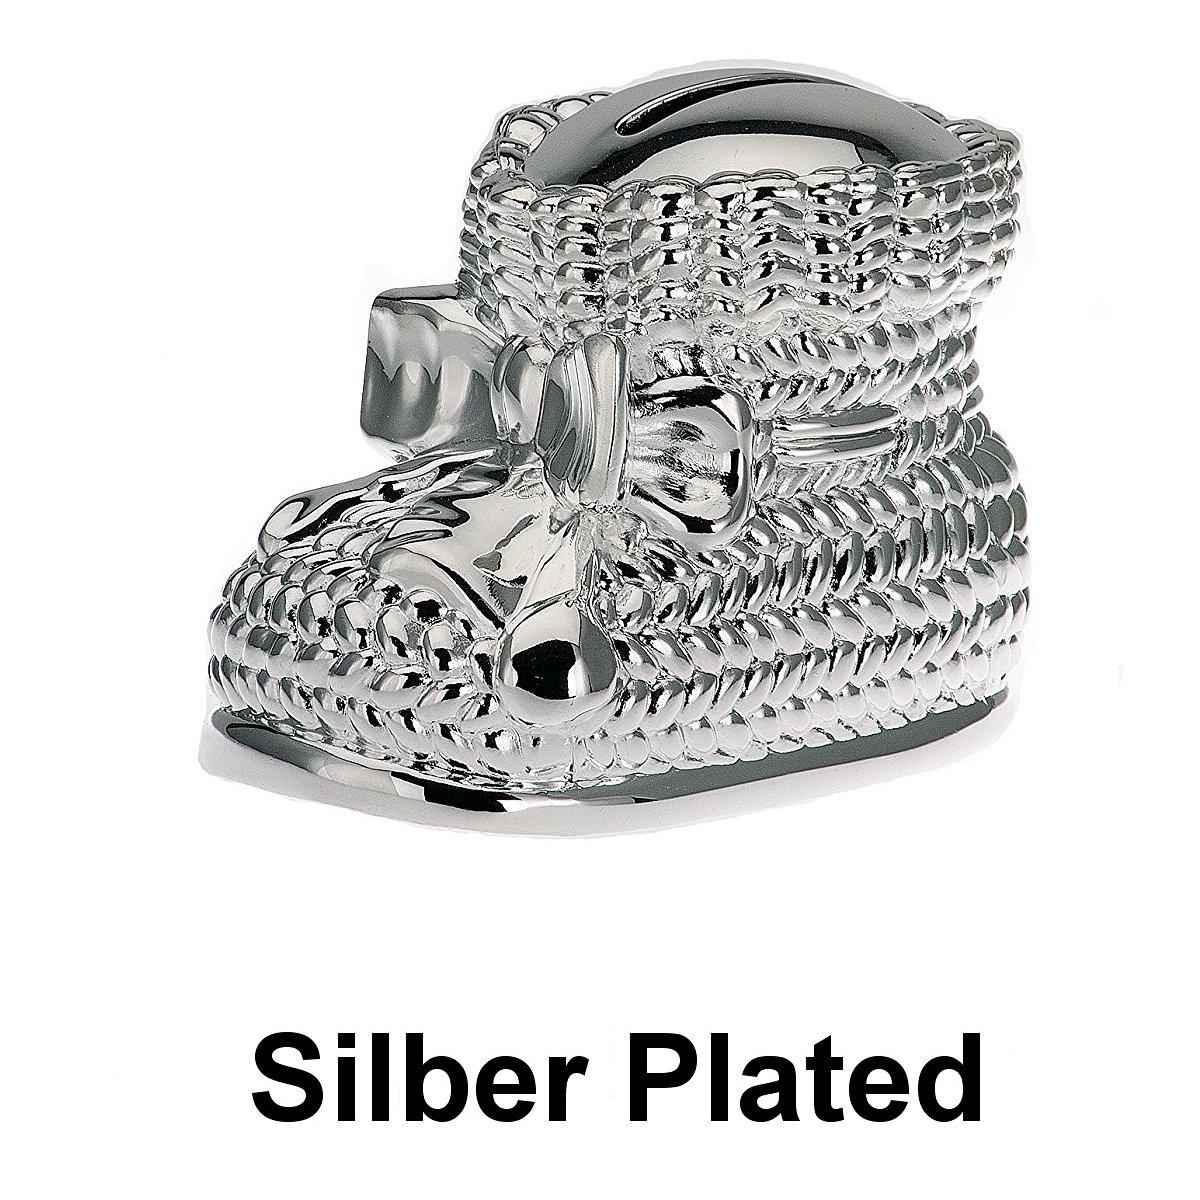 Spardose Schuh 10 cm Silber Plated versilbert in Top Verarbeitung